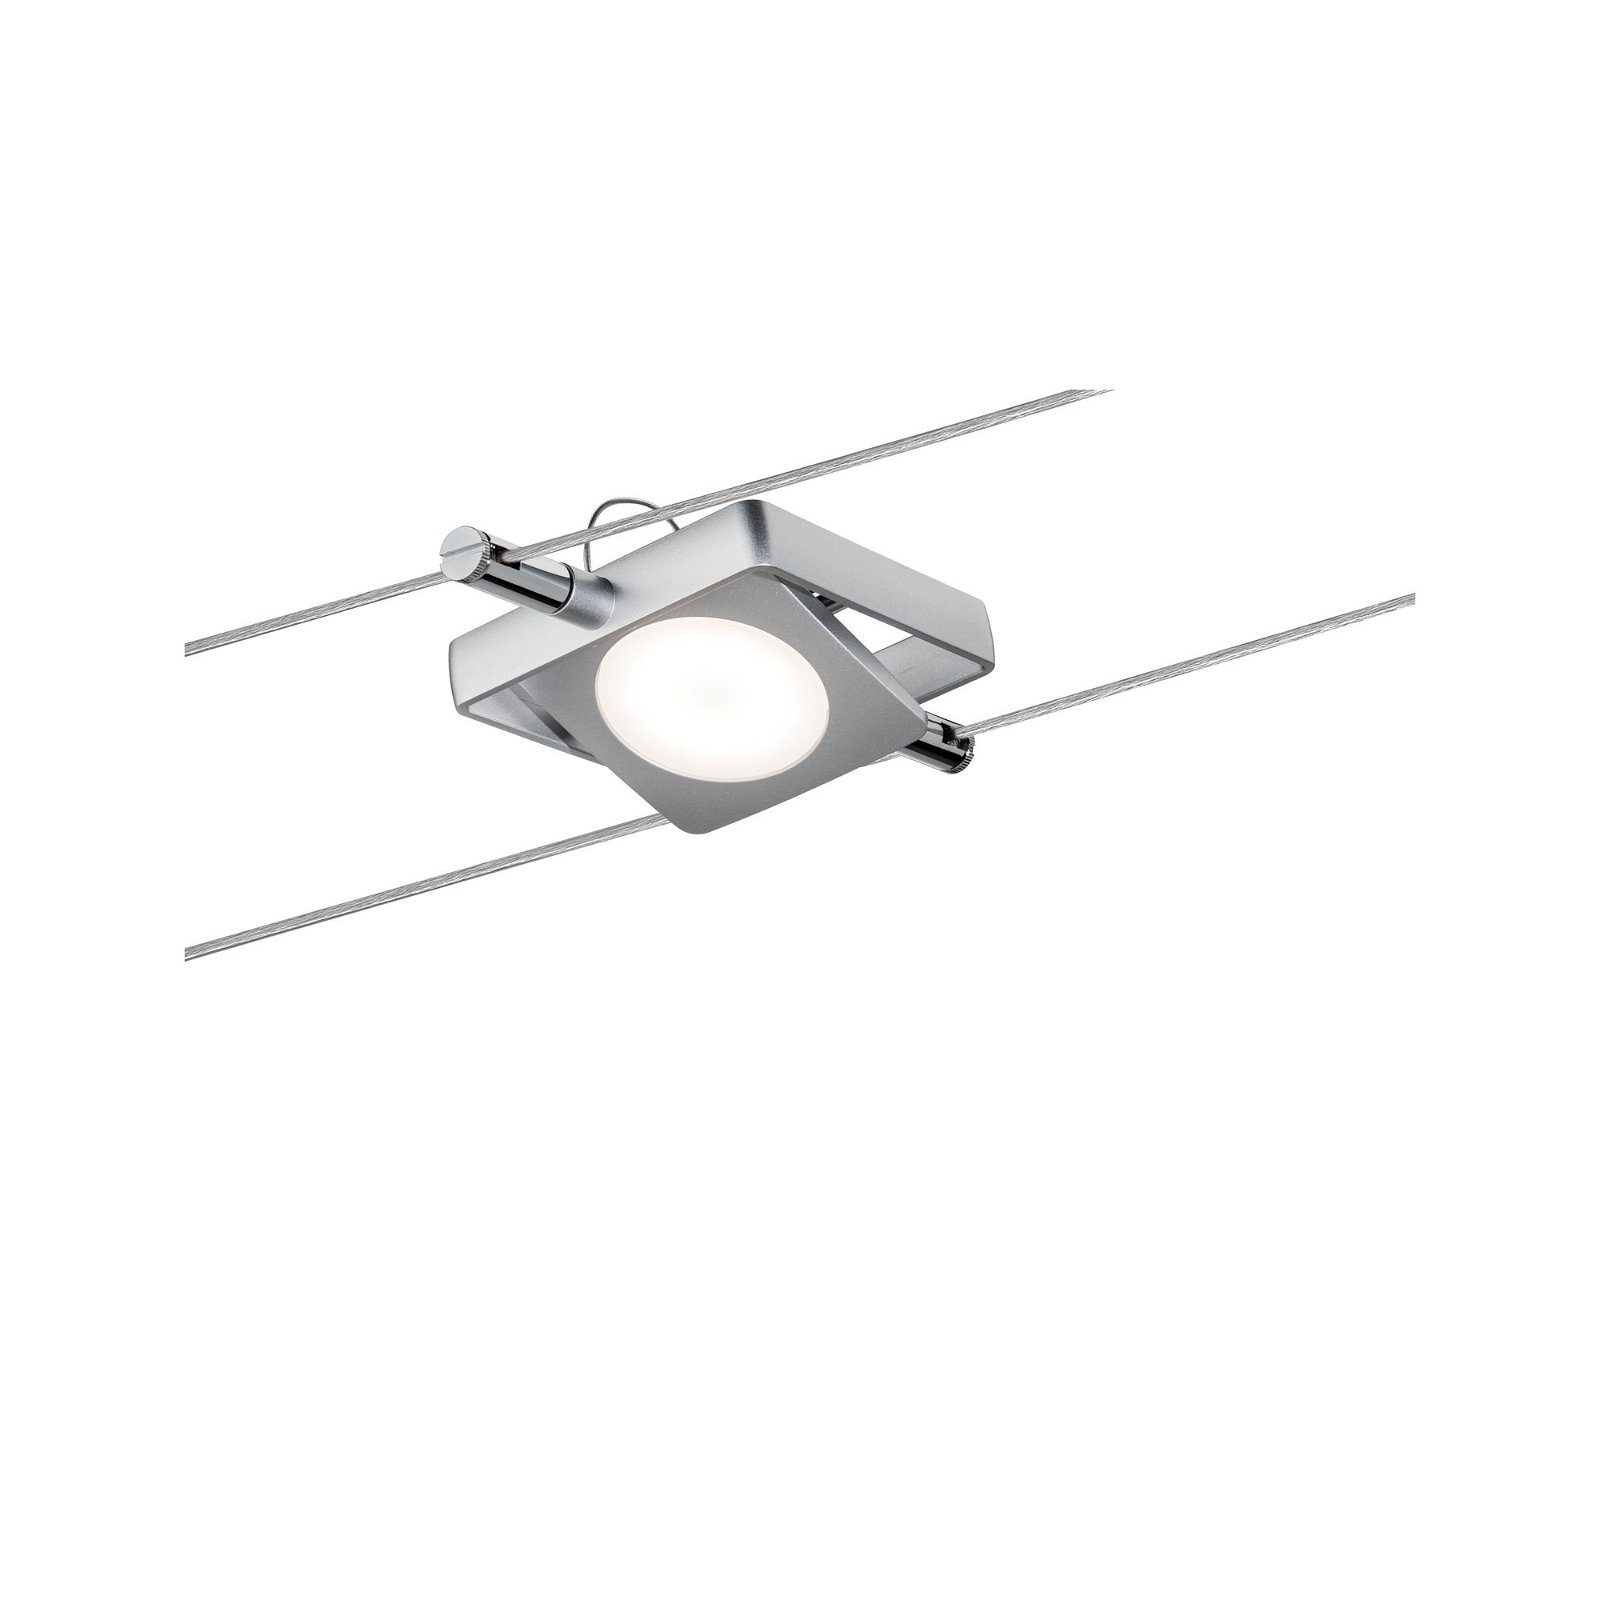 Système câbles LED Bluetooth MacLED Kit de base 4x200lm 4x4W Tunable White 230/12V Chrome mat